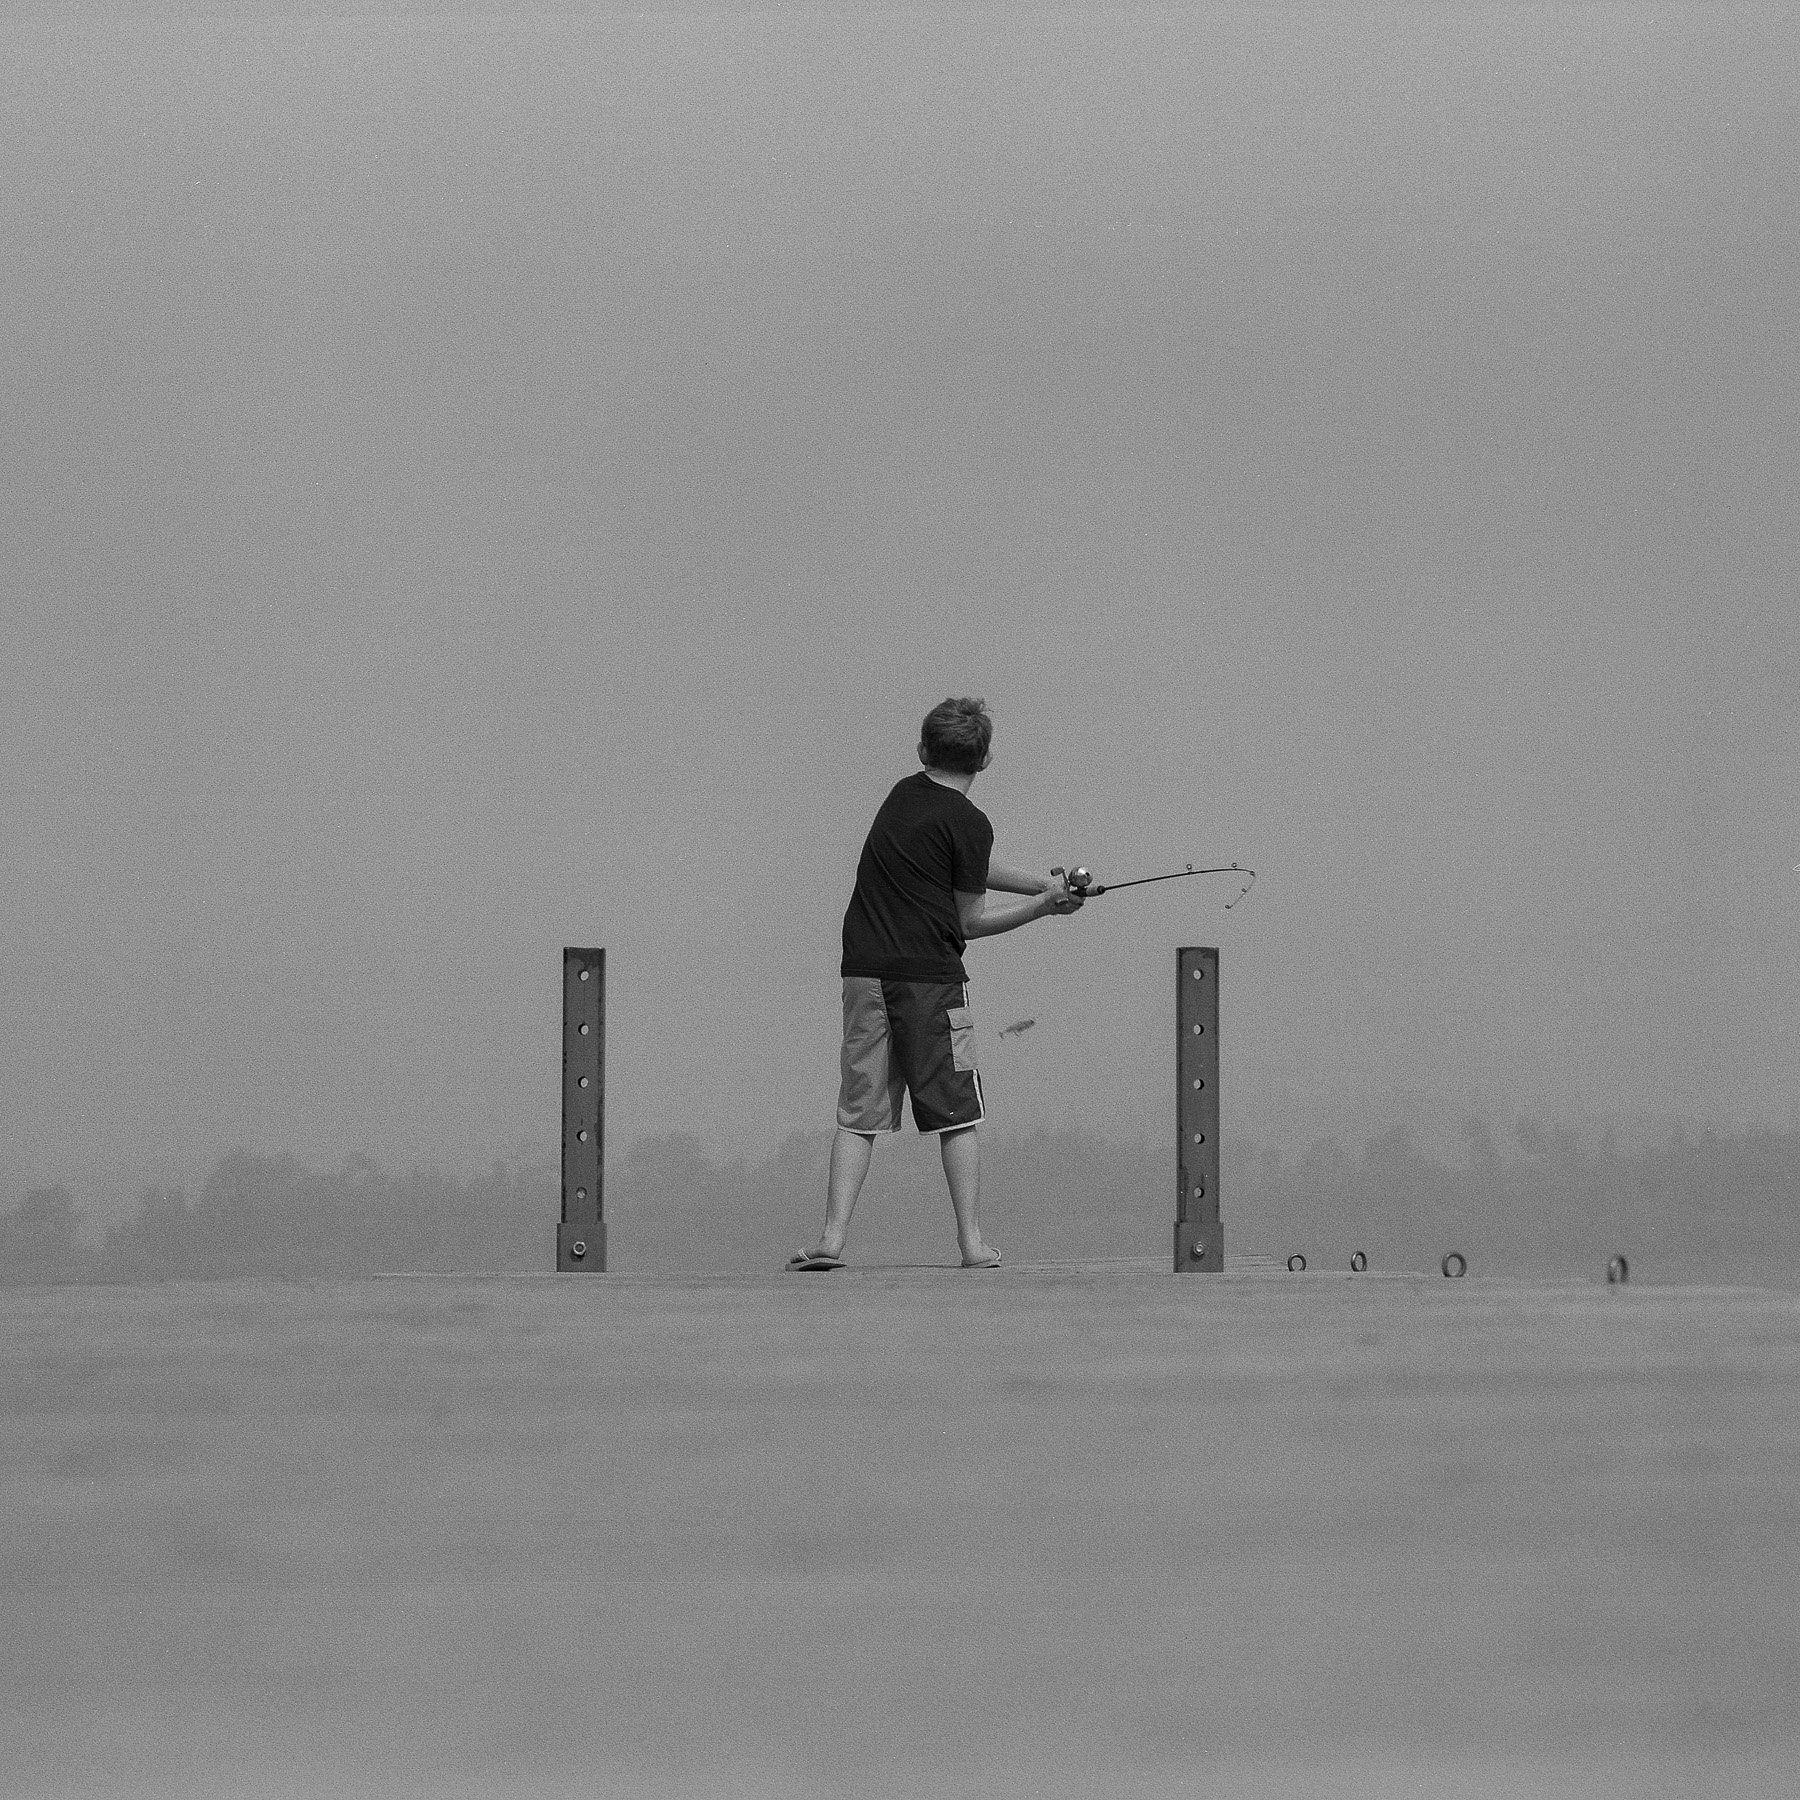 Fishing_RB67_90mm_ToddConnaghan.jpg